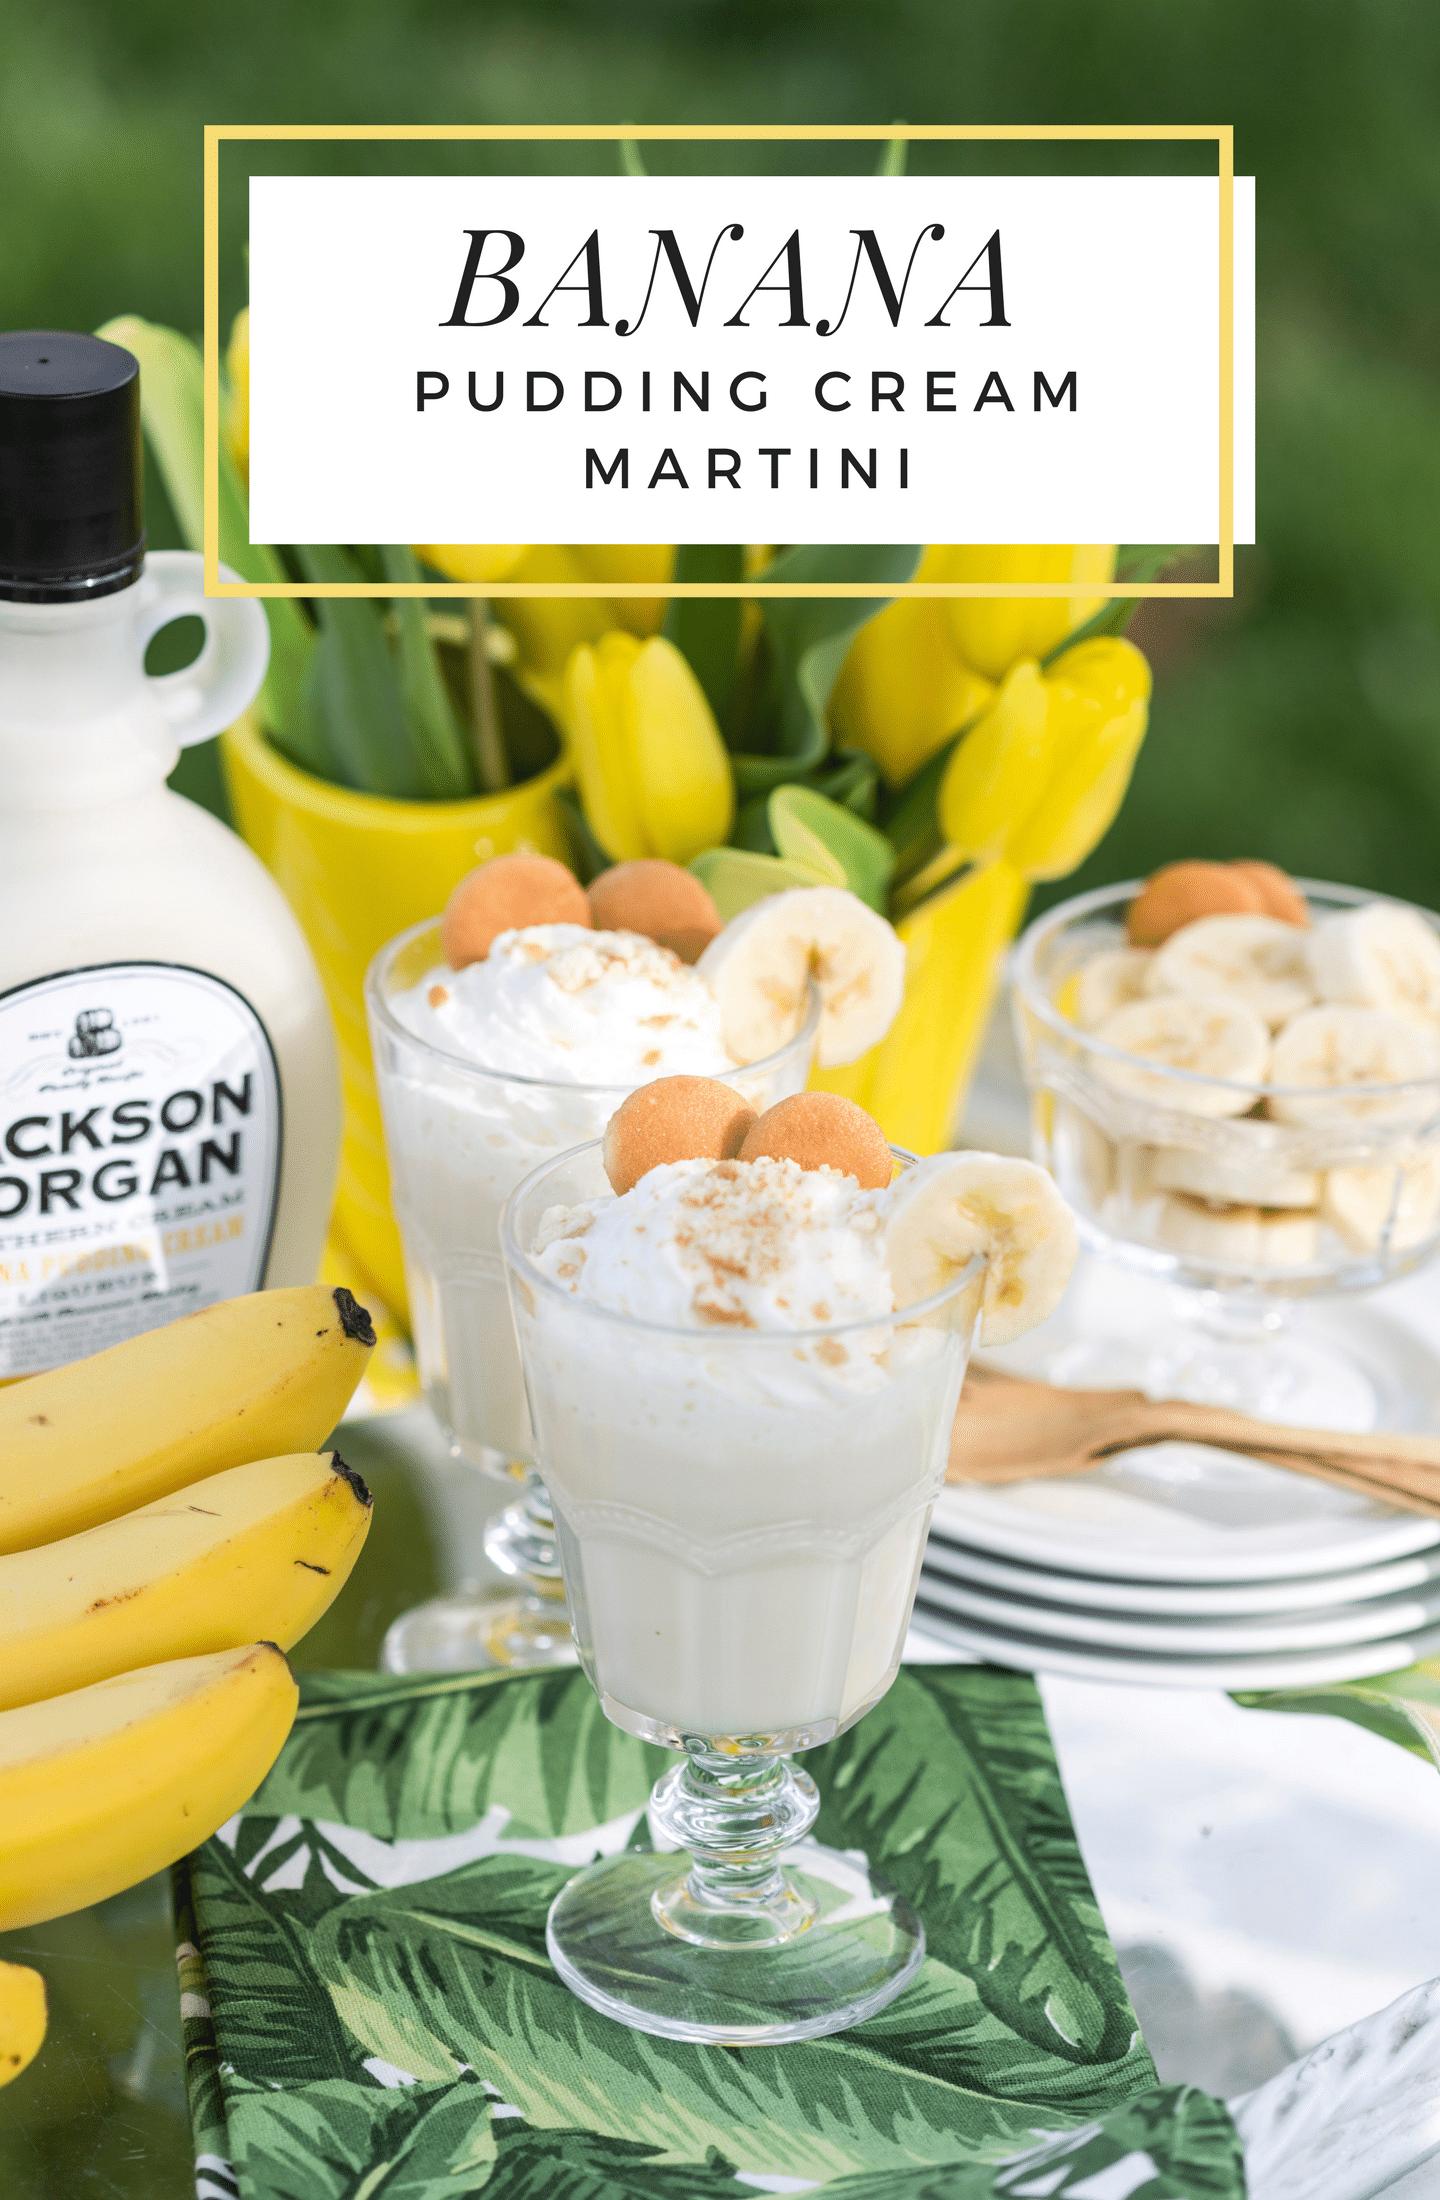 Easy and Delish Banana Pudding Cream Martini!